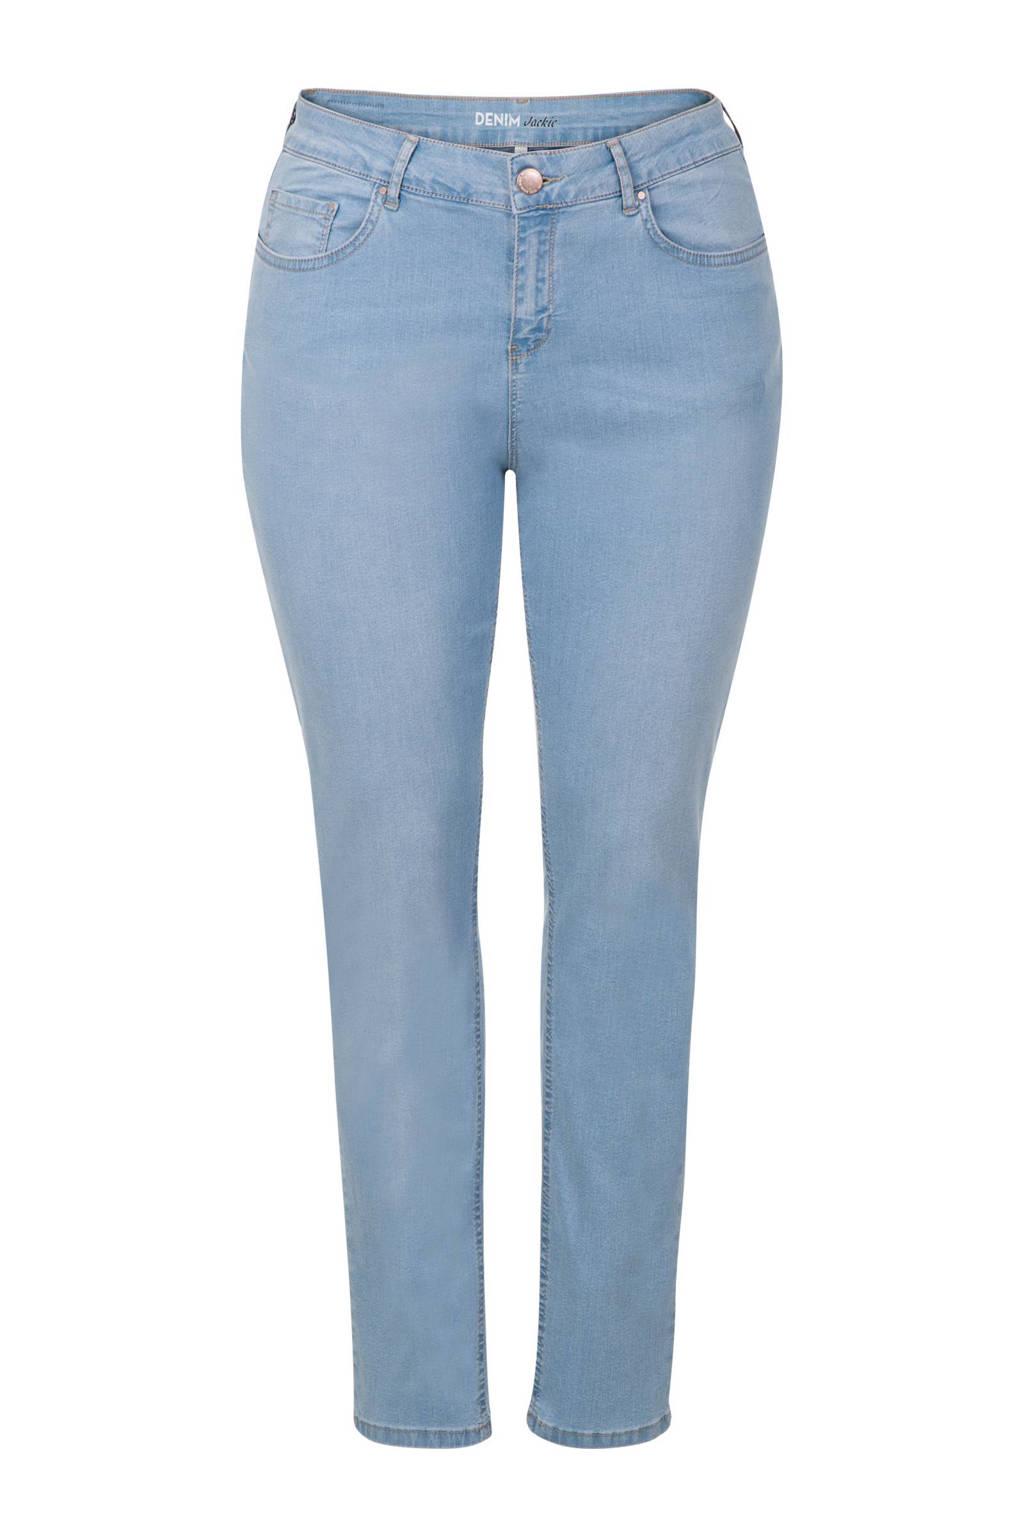 Miss Etam Plus high waisted slim fit jeans (32 inch), Light denim